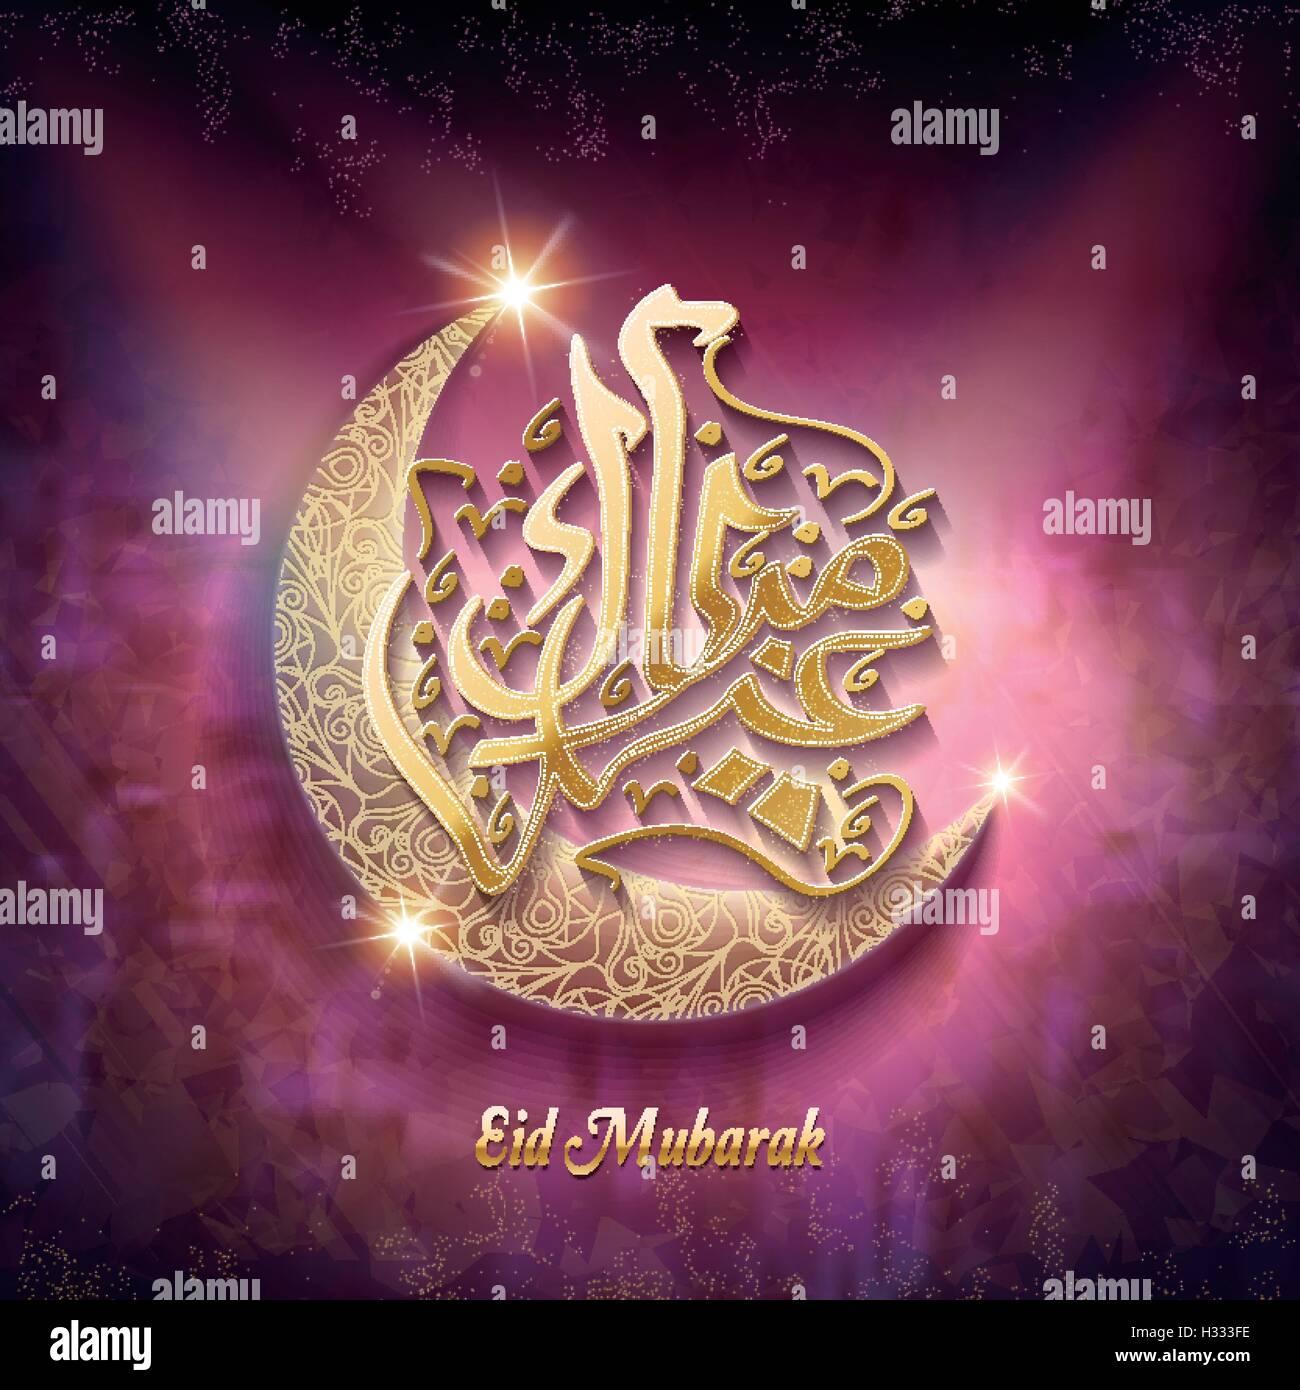 Eid Mubarak Calligraphy Design Delicate Holiday Greeting